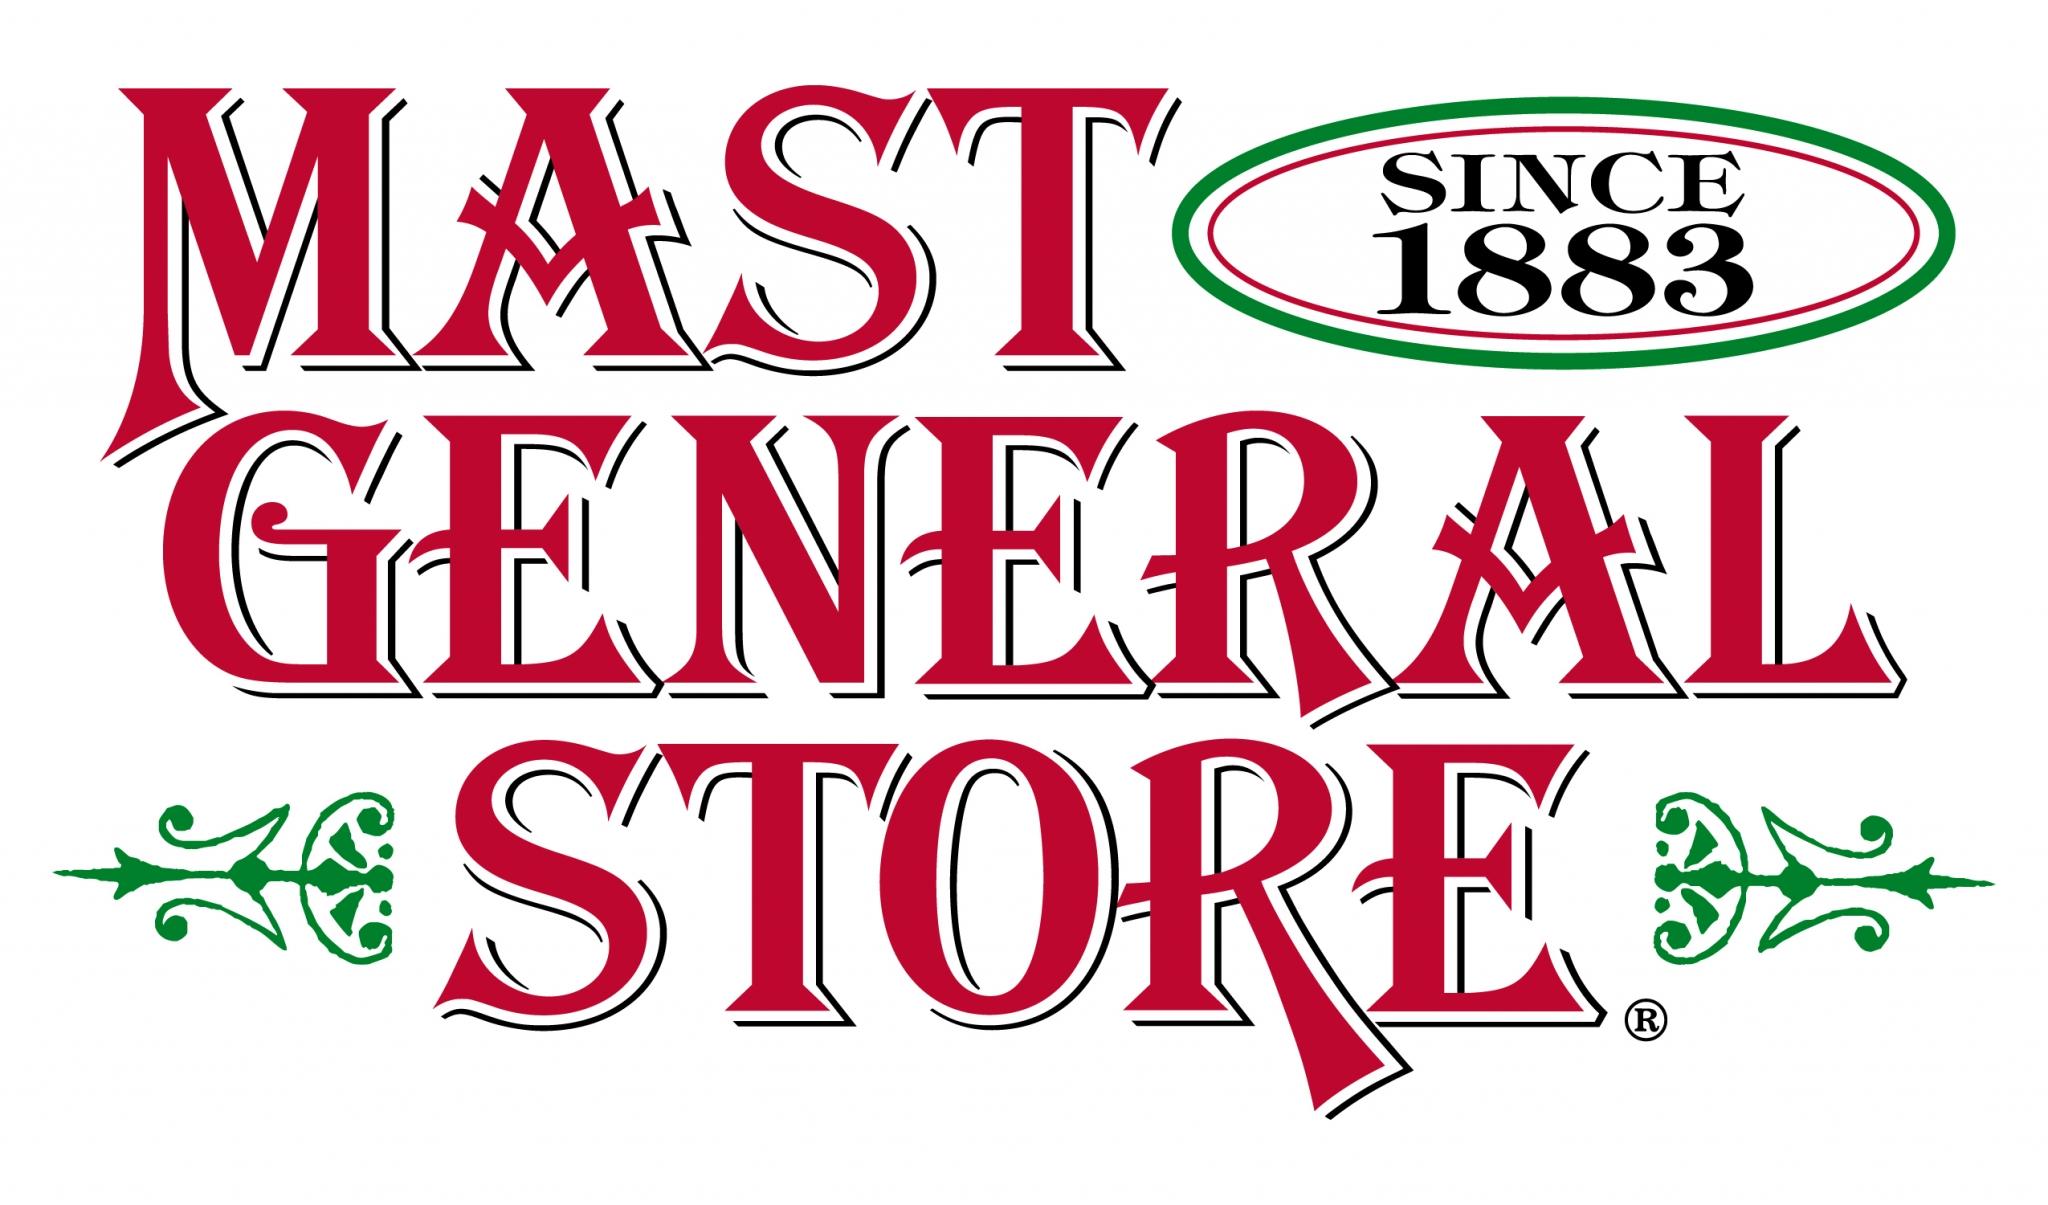 Mast General Store logo